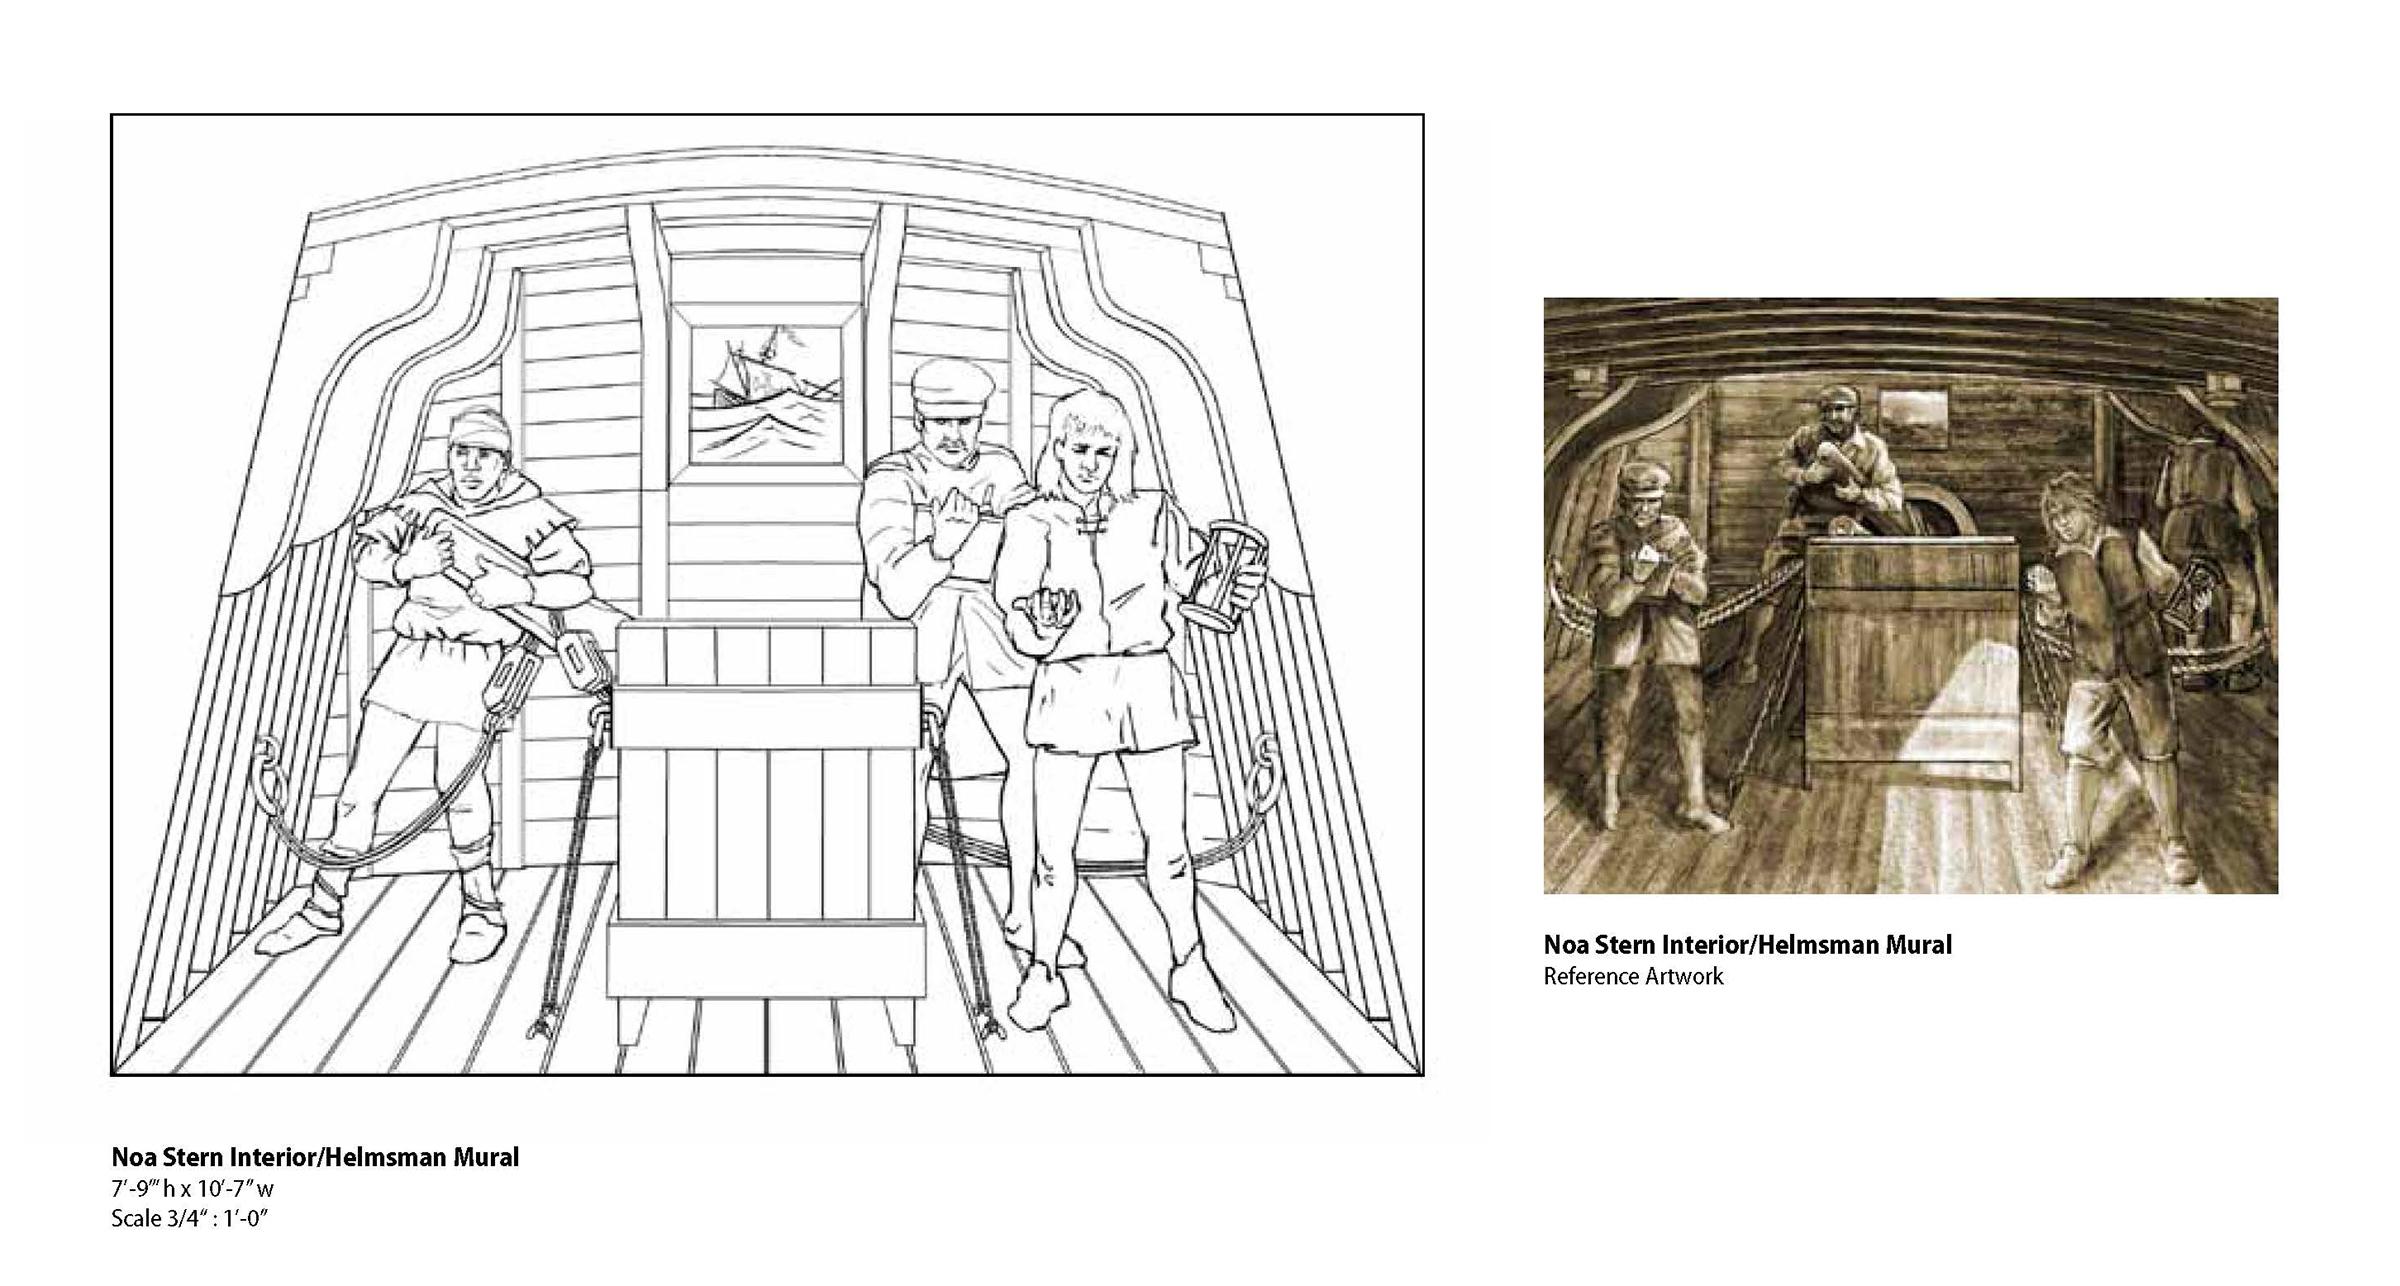 Concept for Noa Stern Interior/Helmsman • Digital Illustration, Museum Of Florida History, Tallahassee, FL © KT